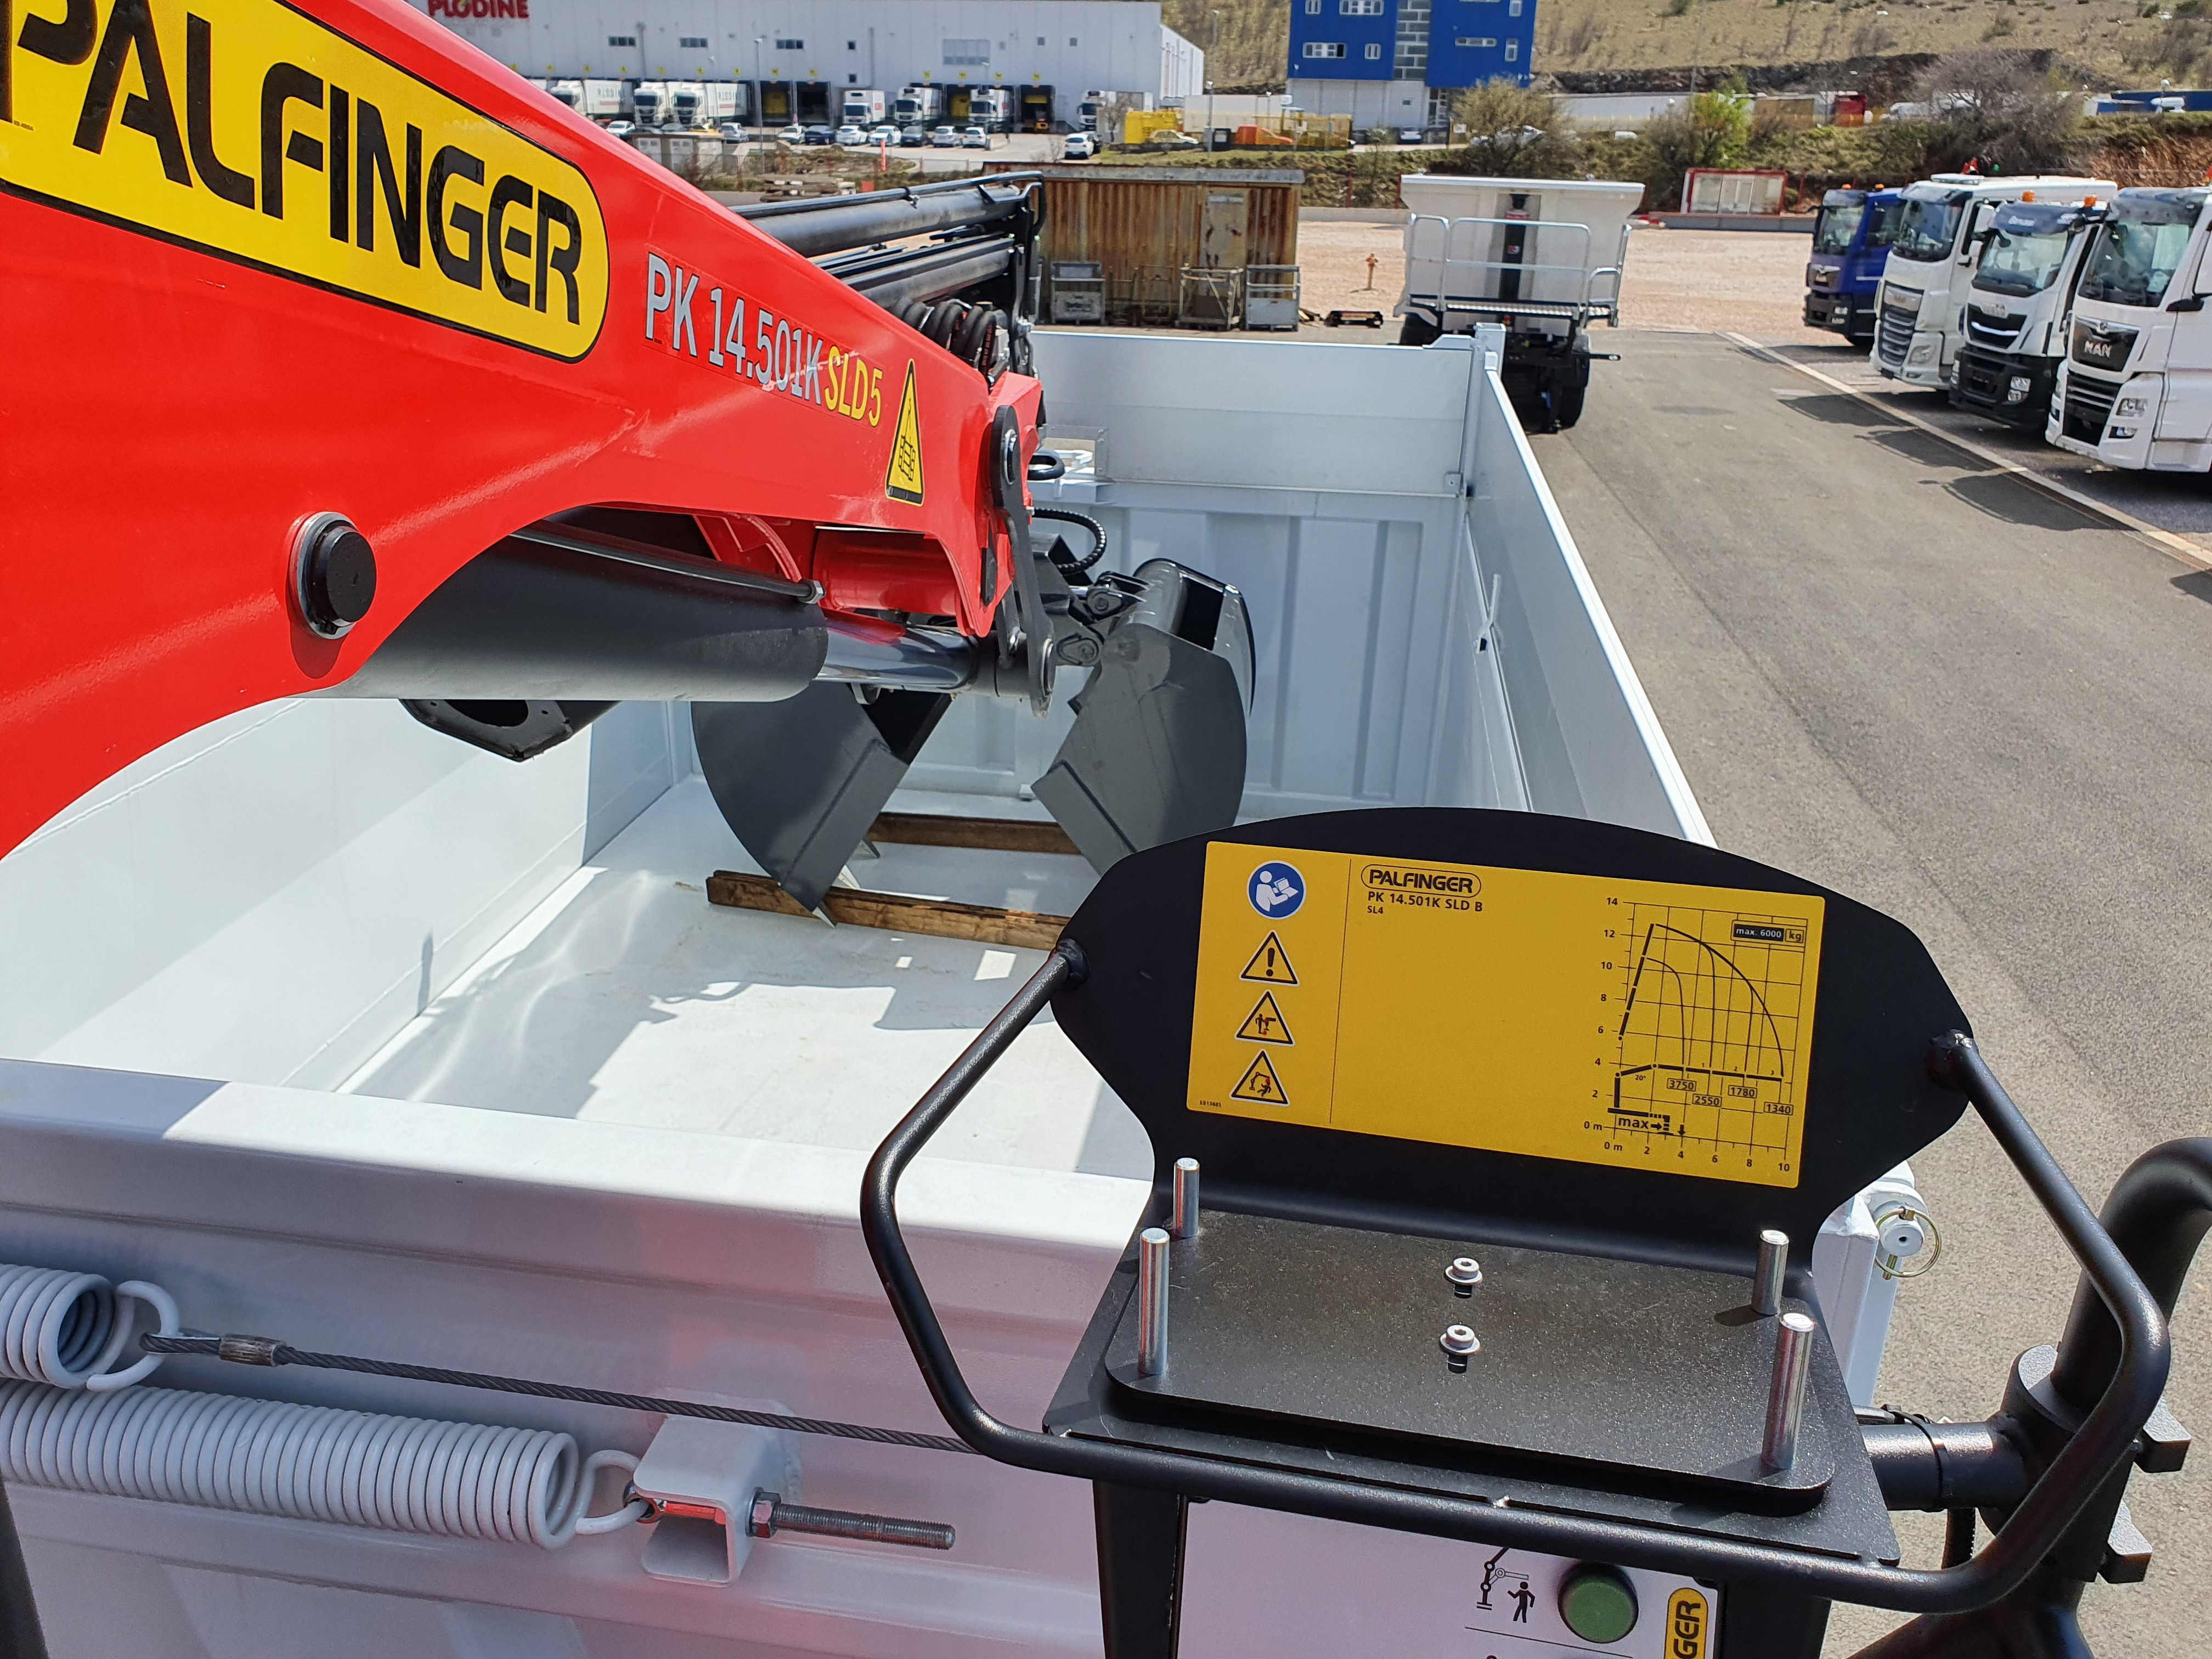 dizalica-palfinger-pk14.501sld5-kiper-kamionska-nadogradnja_6